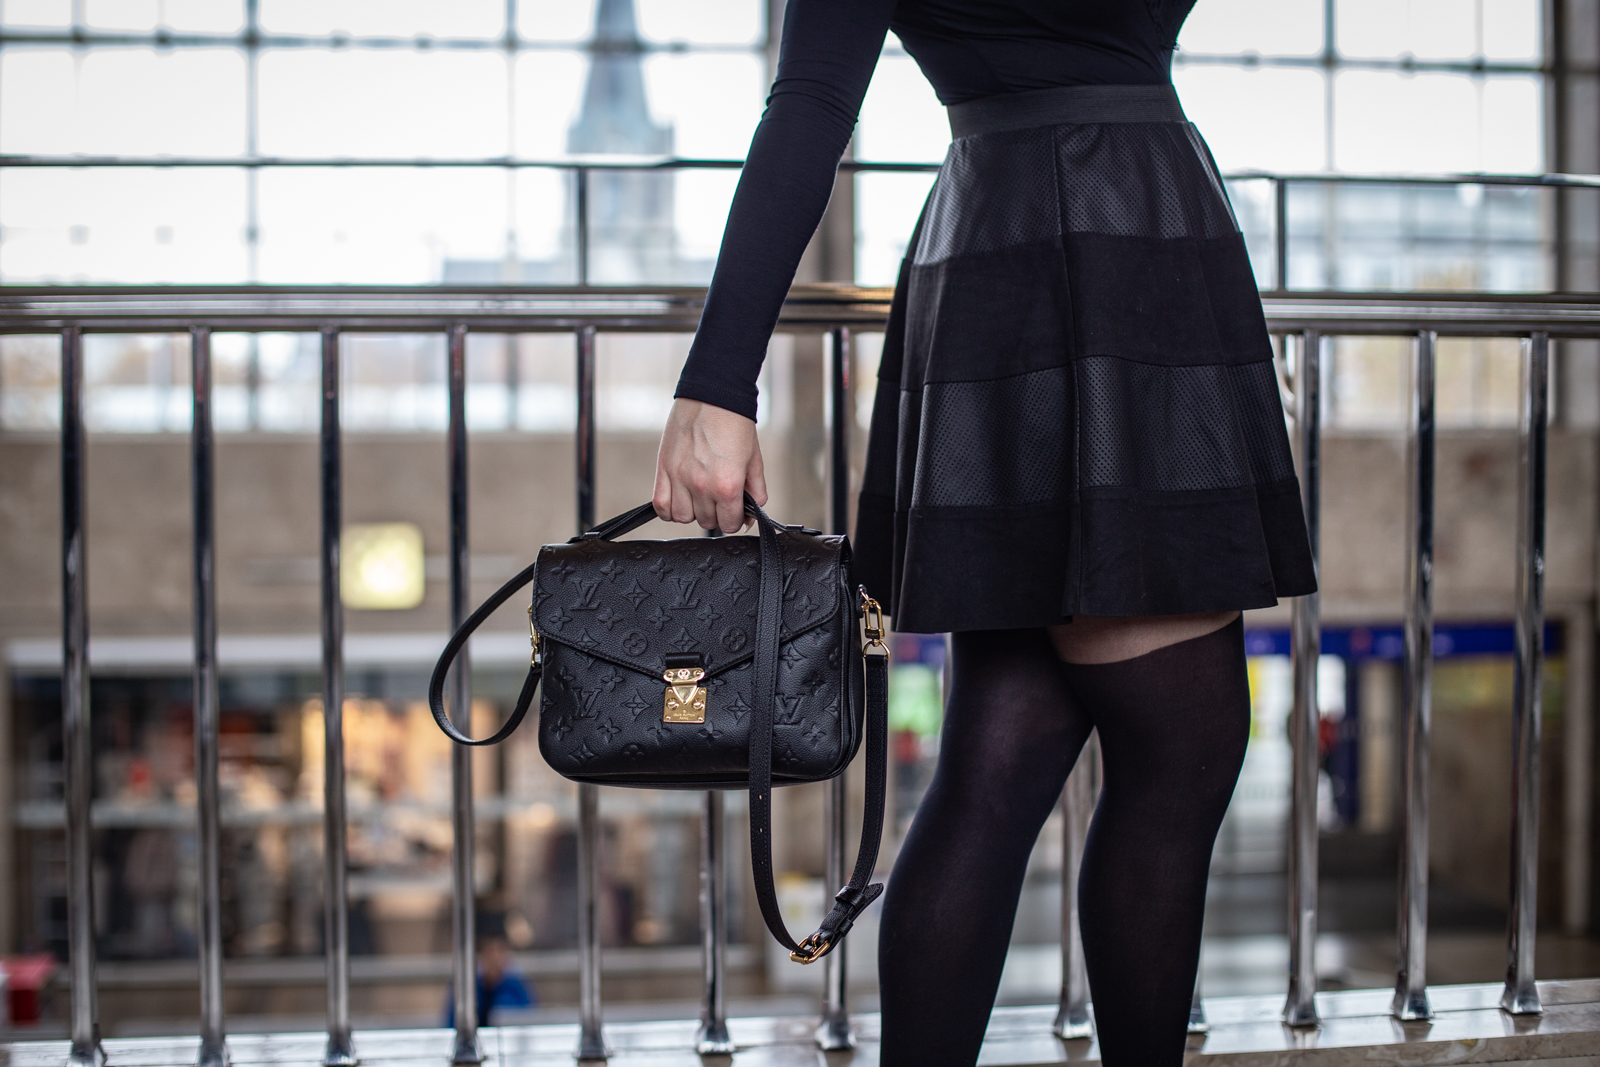 1600-louis-vuitton-metis-louisvuitton-fashion-outfit-justizpalast-violetfleur-violet-fleur-nadjanemetz-nadja-nemetz-austrianblogger-austrian-blogger-beautyblogger-fashionblogger-modeblogger--435